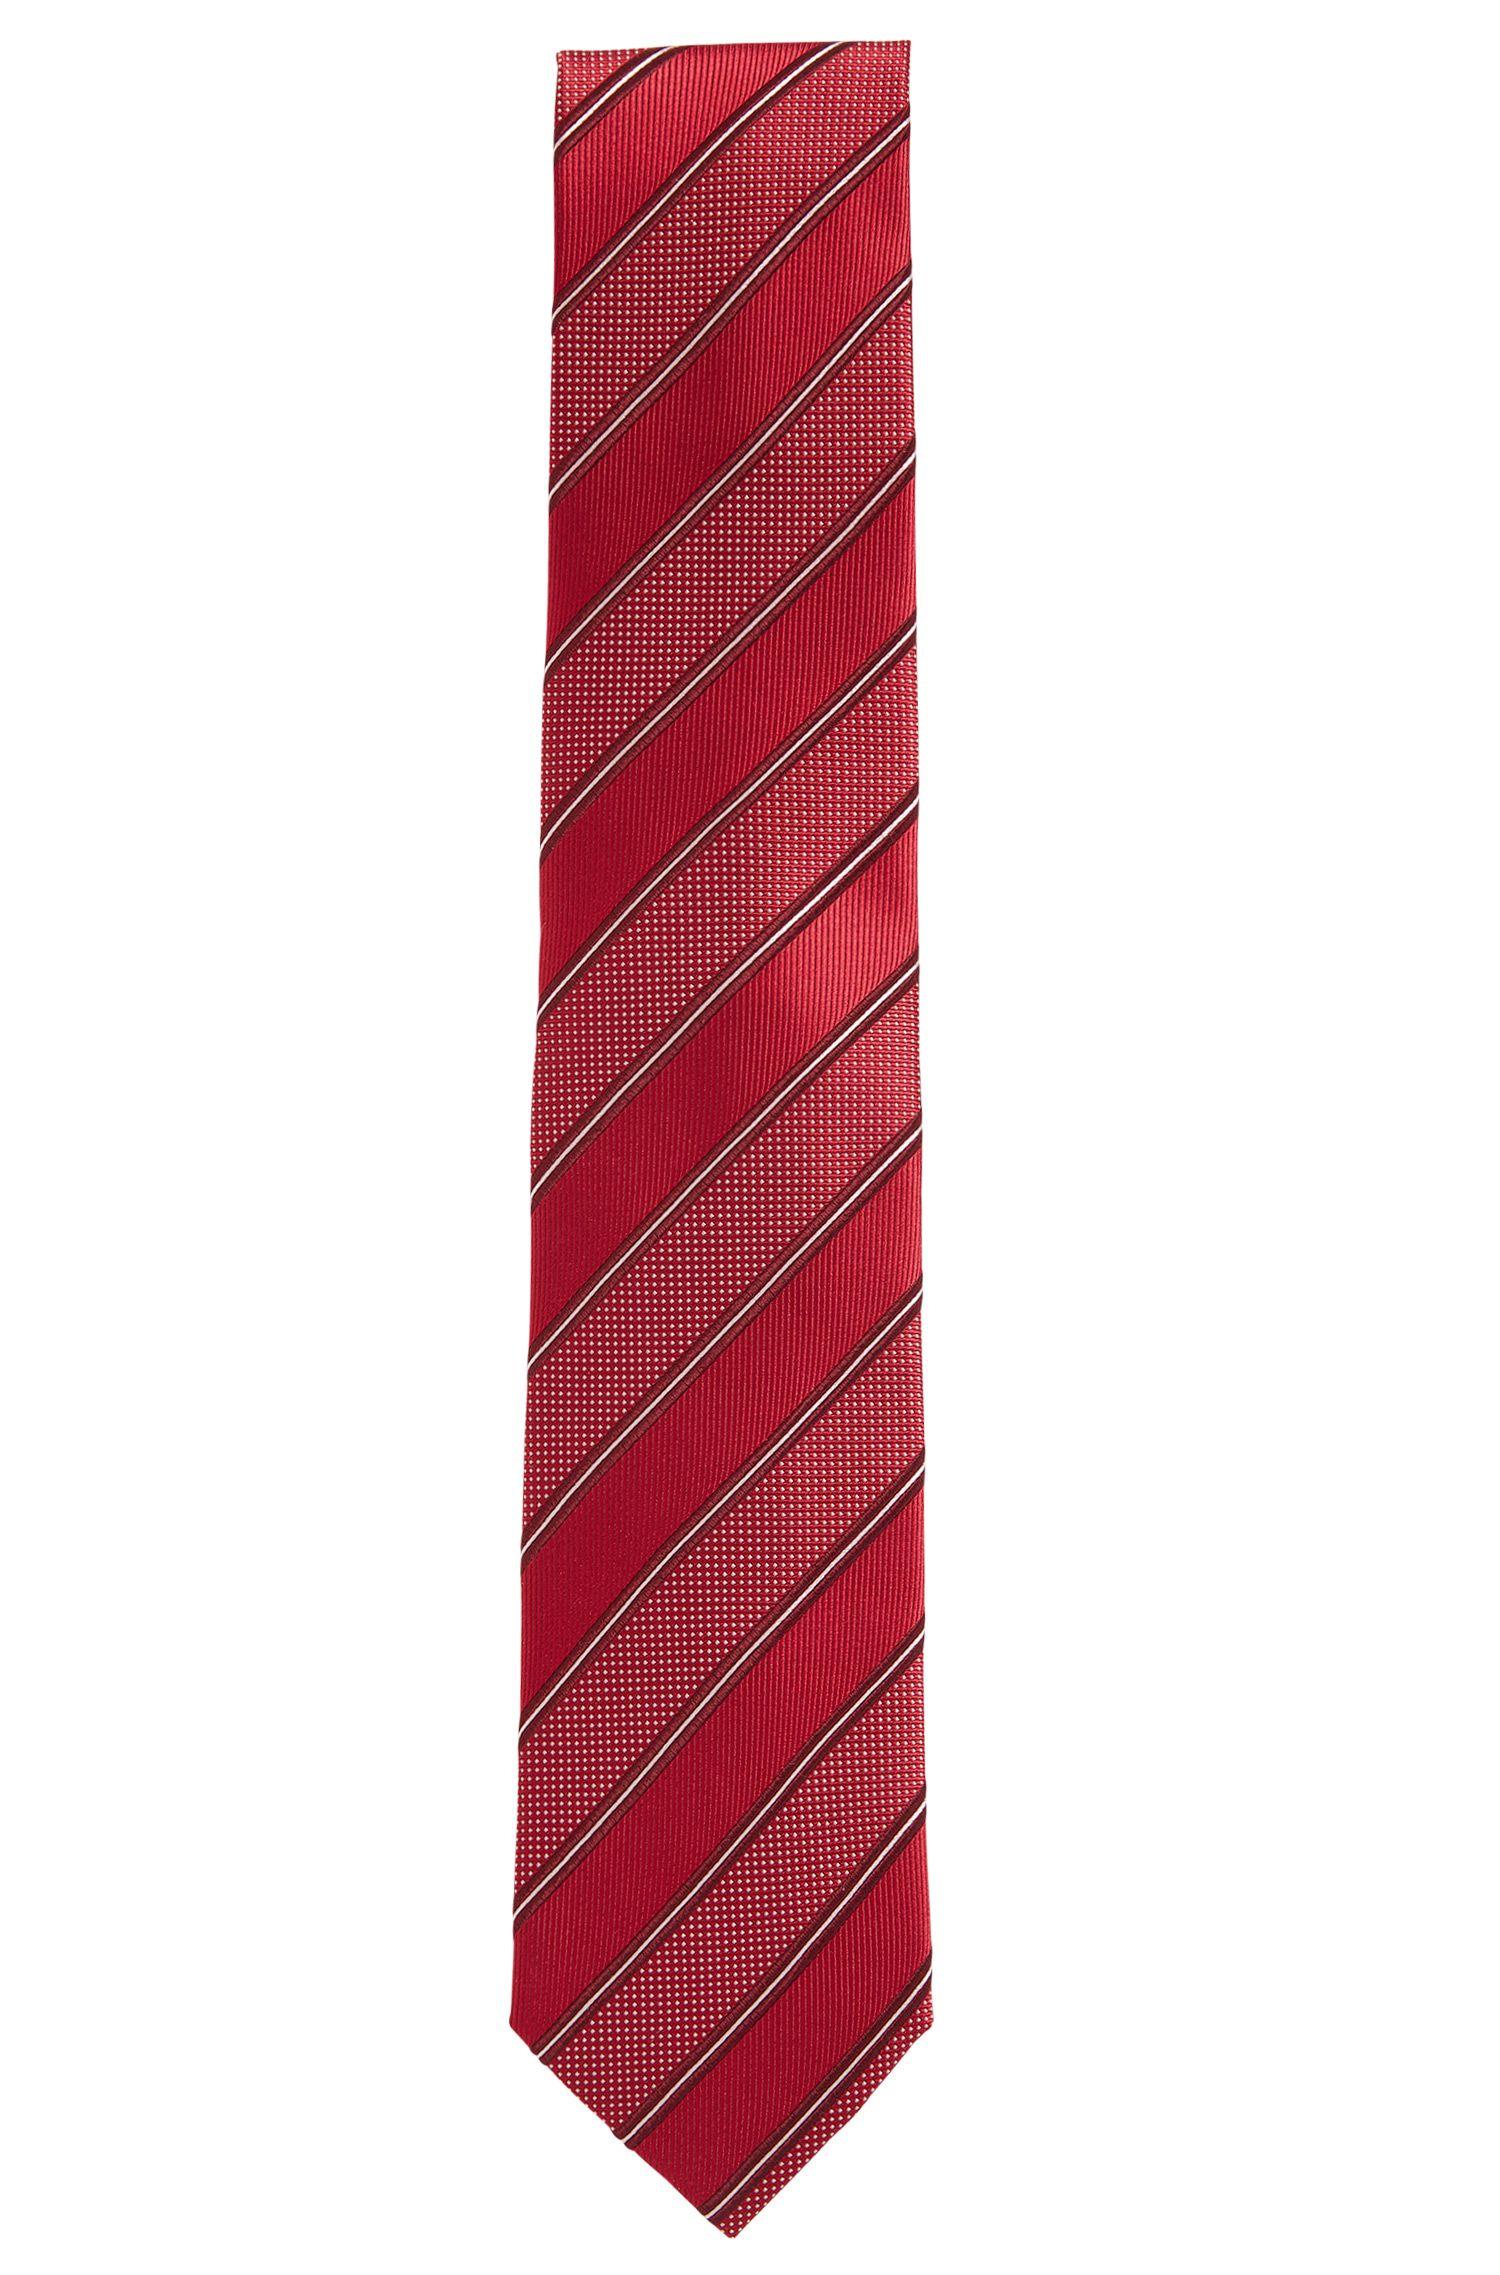 Cravatta jacquard a righe in seta pregiata